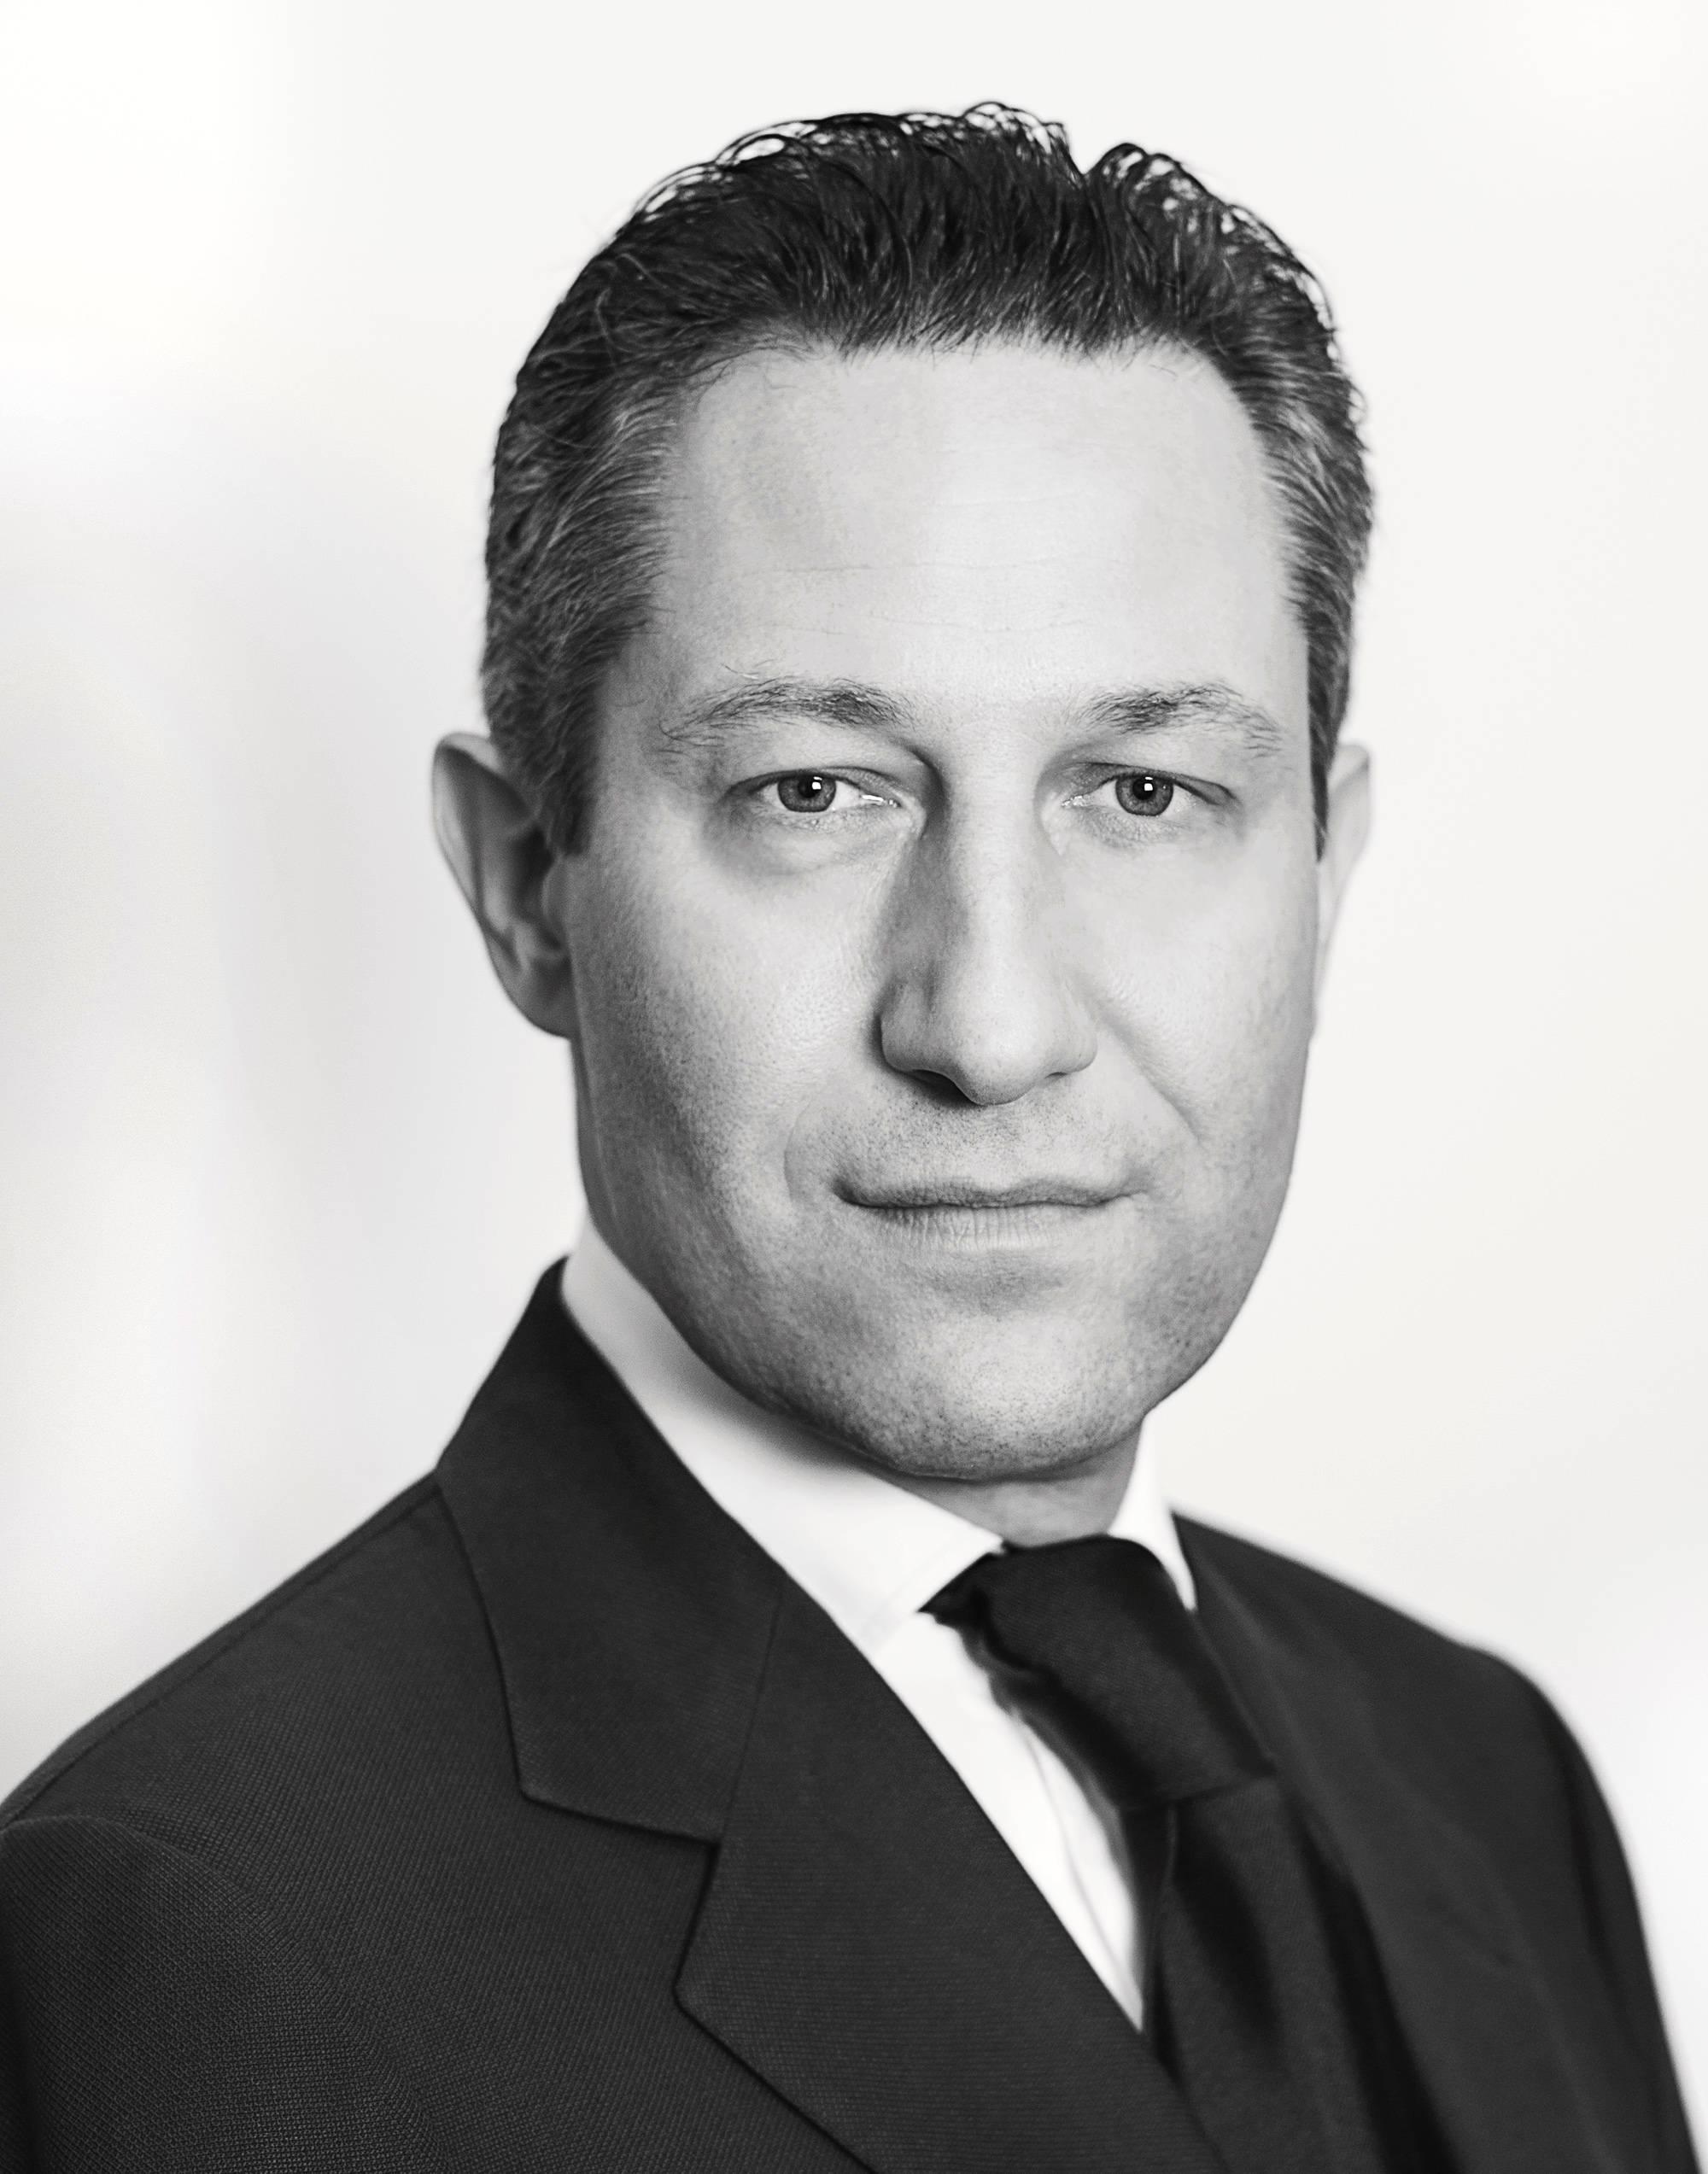 Aurel Bacs, president of the jury of the Grand Prix d'Horlogerie de Geneve.